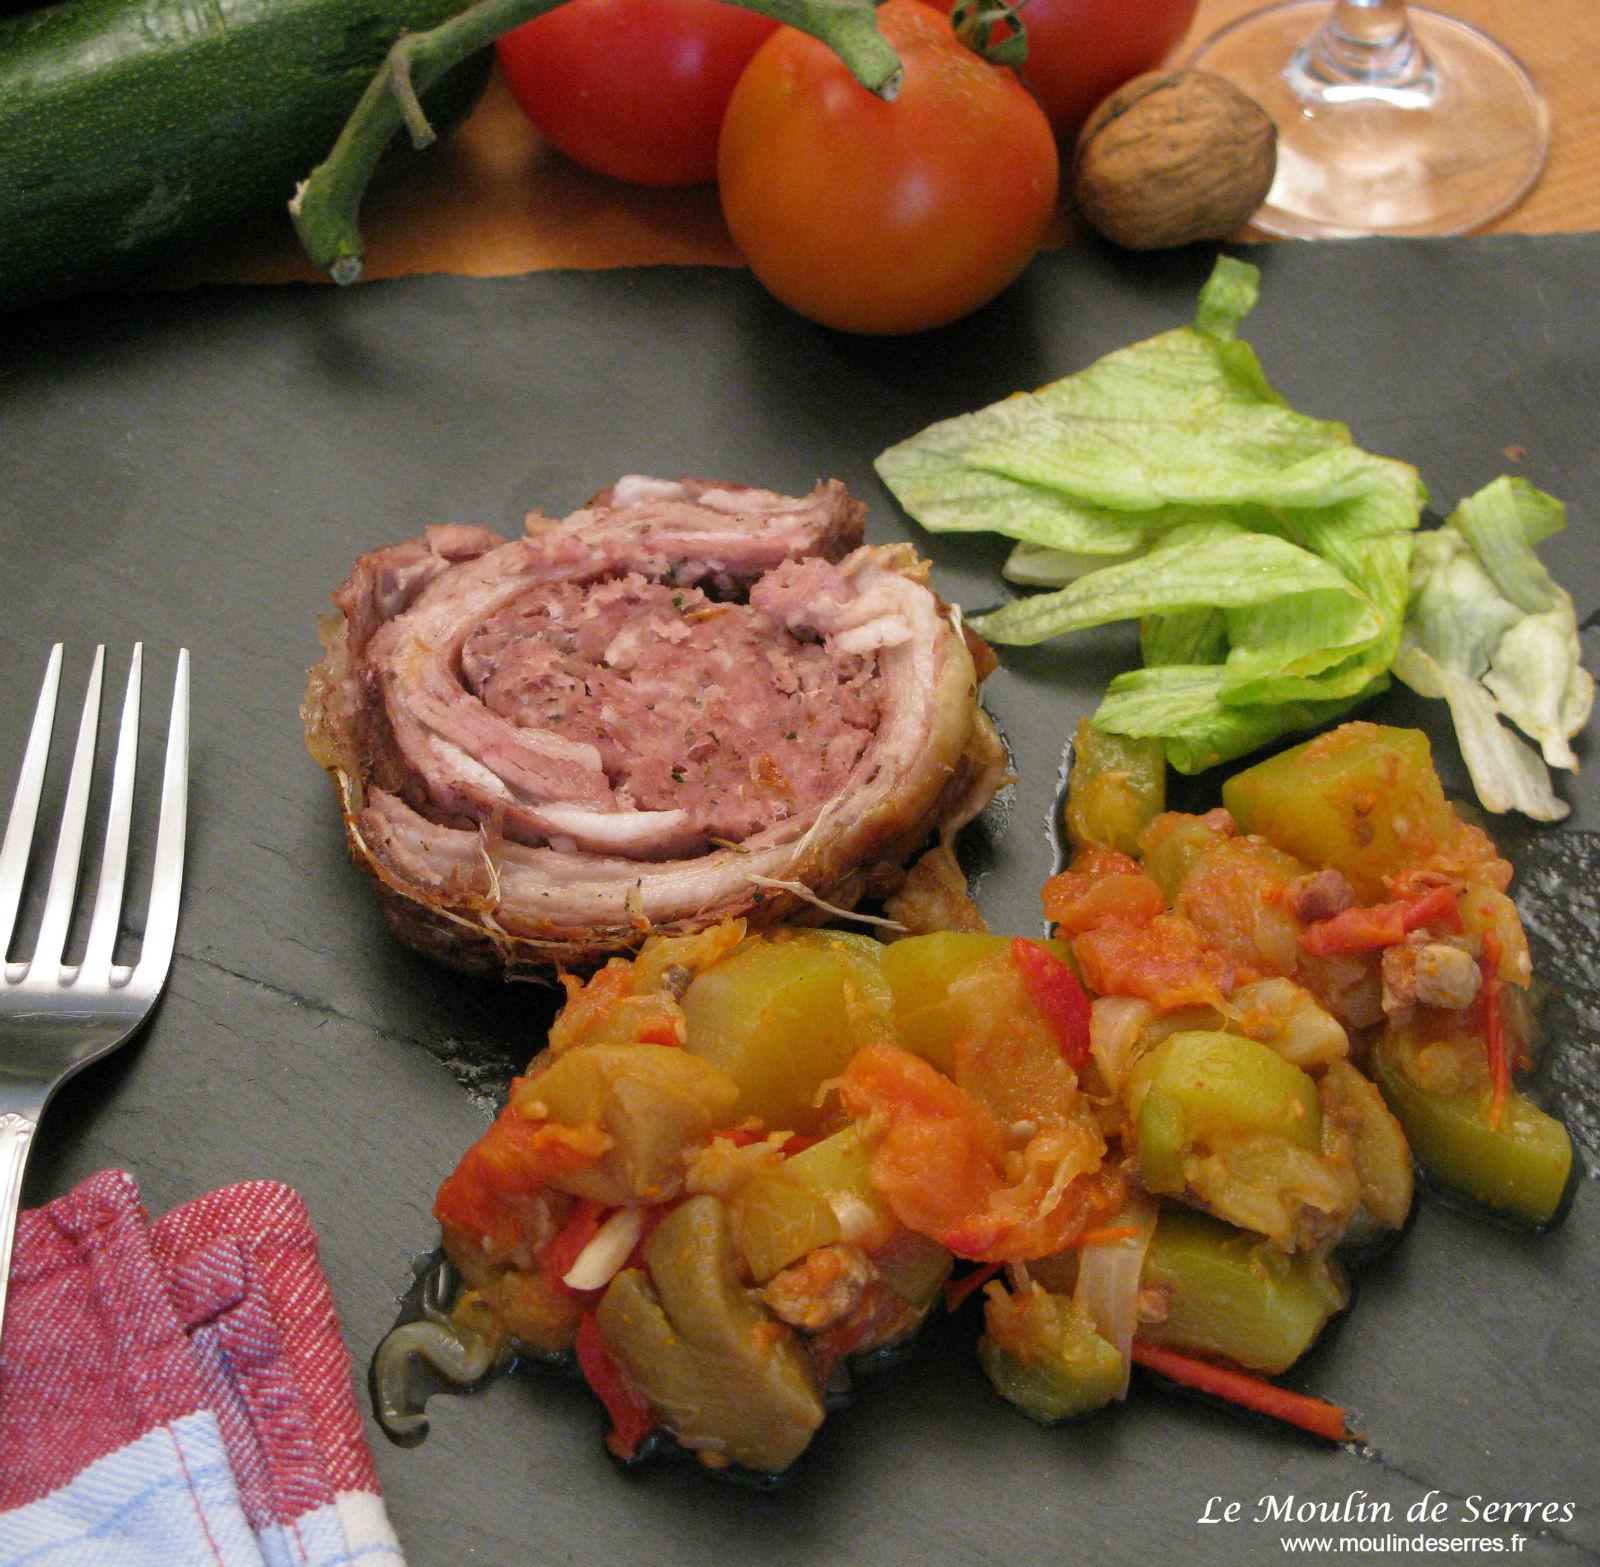 Poitrine d agneau cuisine et 28 images poitrine d - Cuisiner poitrine d agneau ...